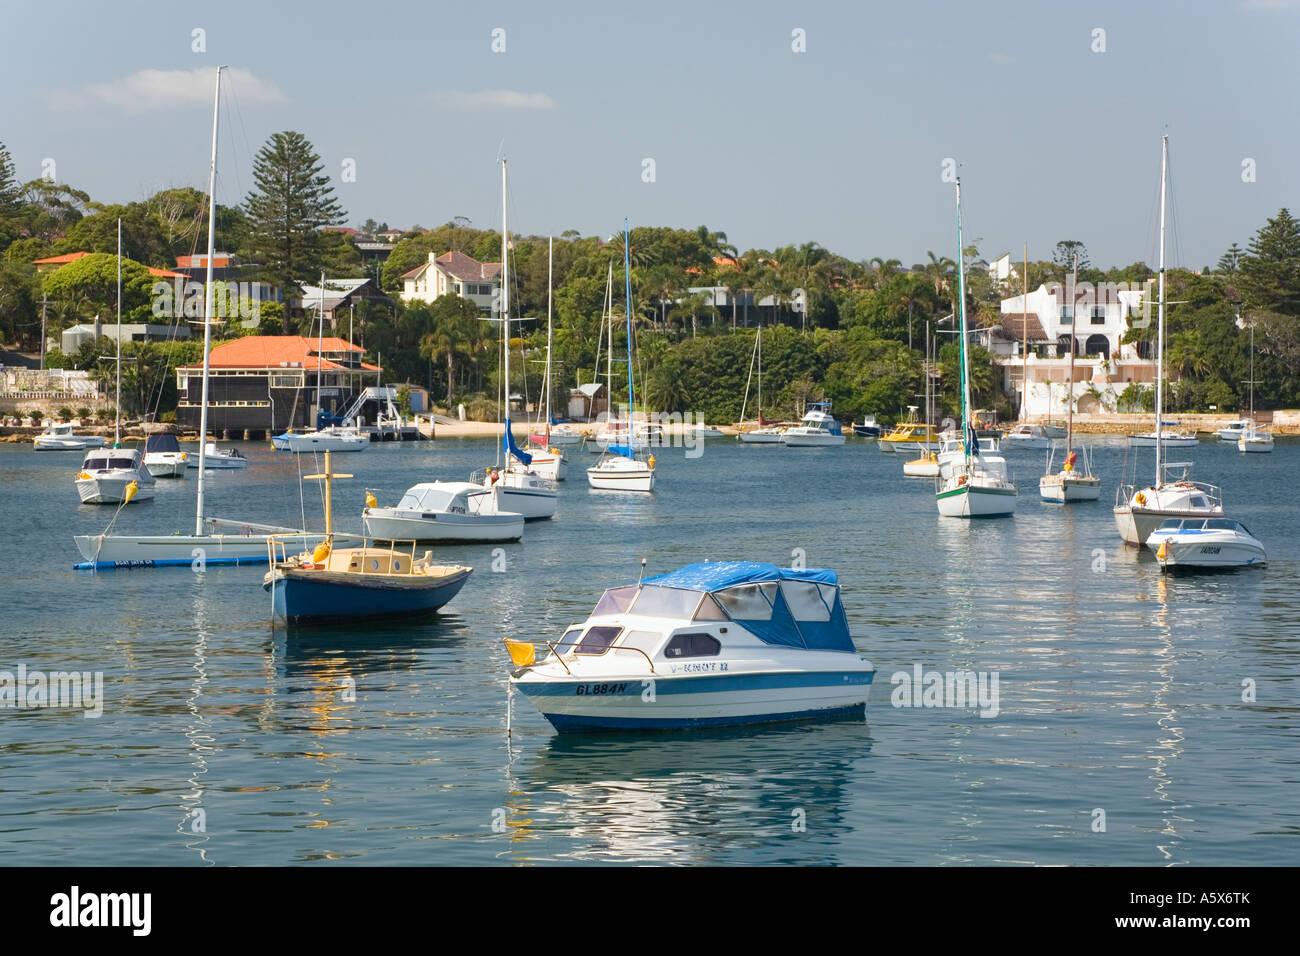 Watsons Bay - Sydney, New South Wales AUSTRALIA - Stock Image